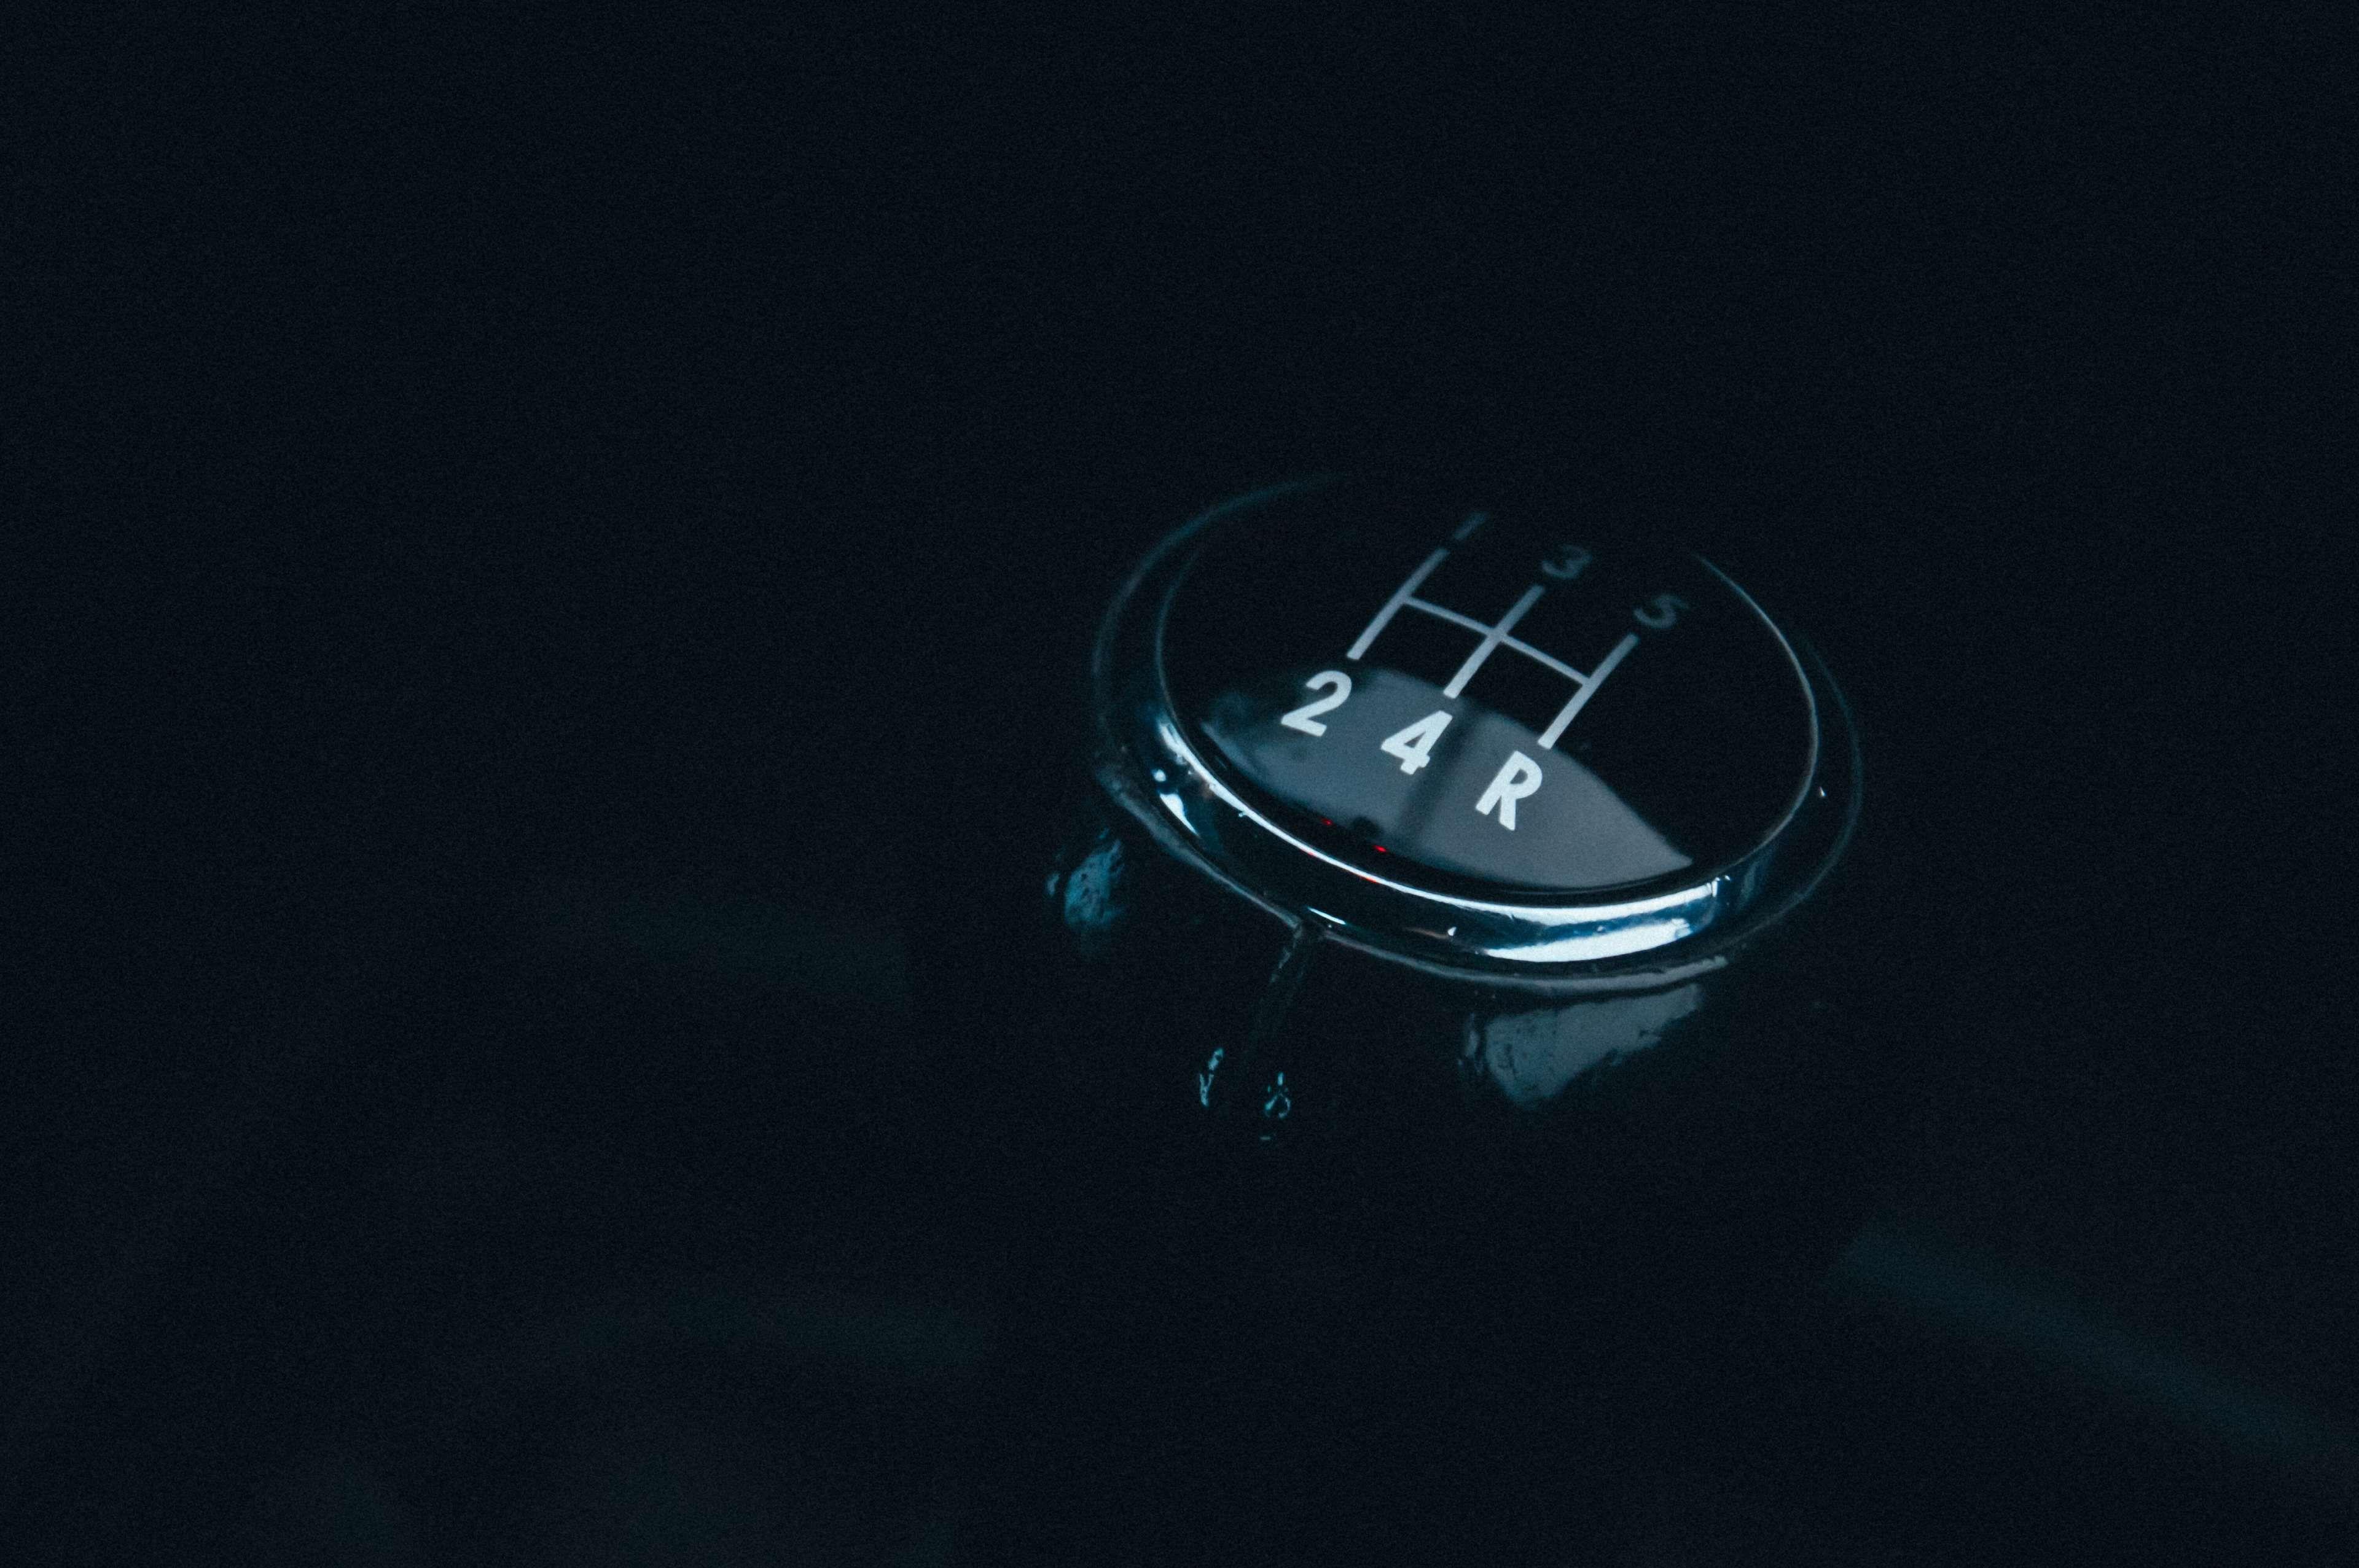 car, gear shift, gears, public domain images 4k wallpaper